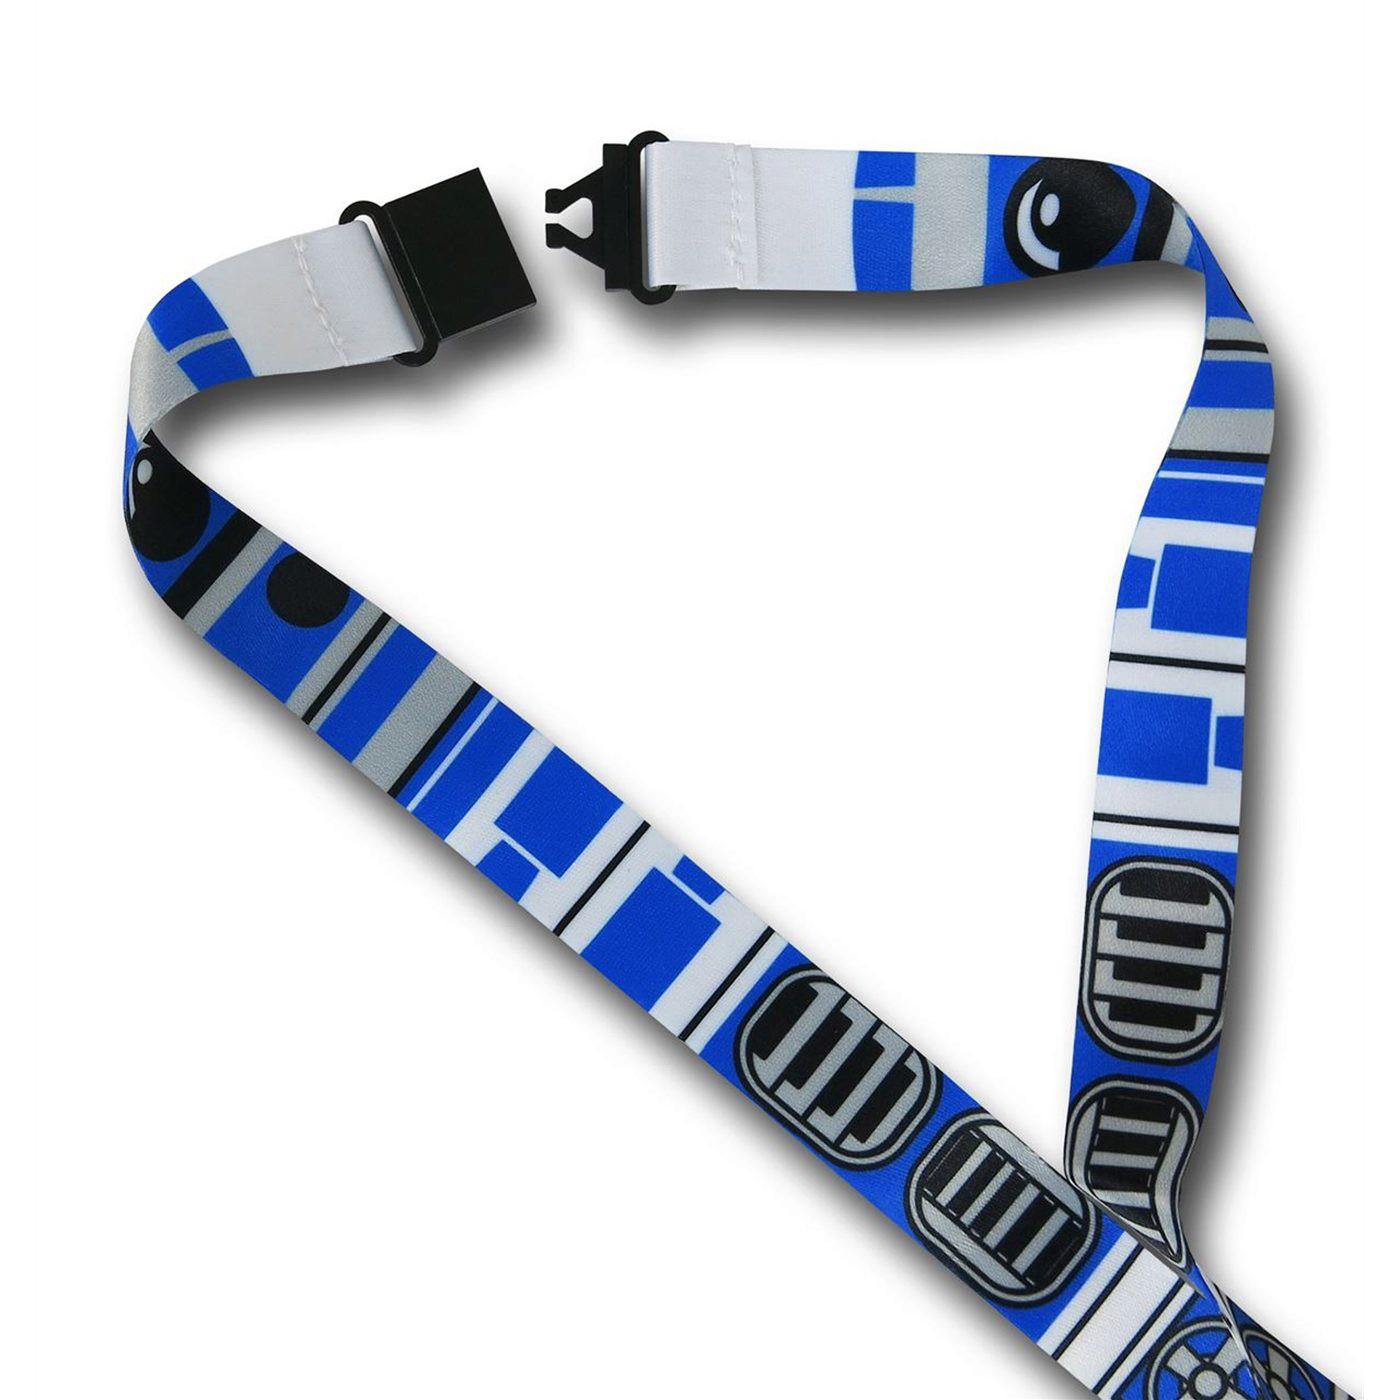 Star Wars R2D2 Costume Lanyard